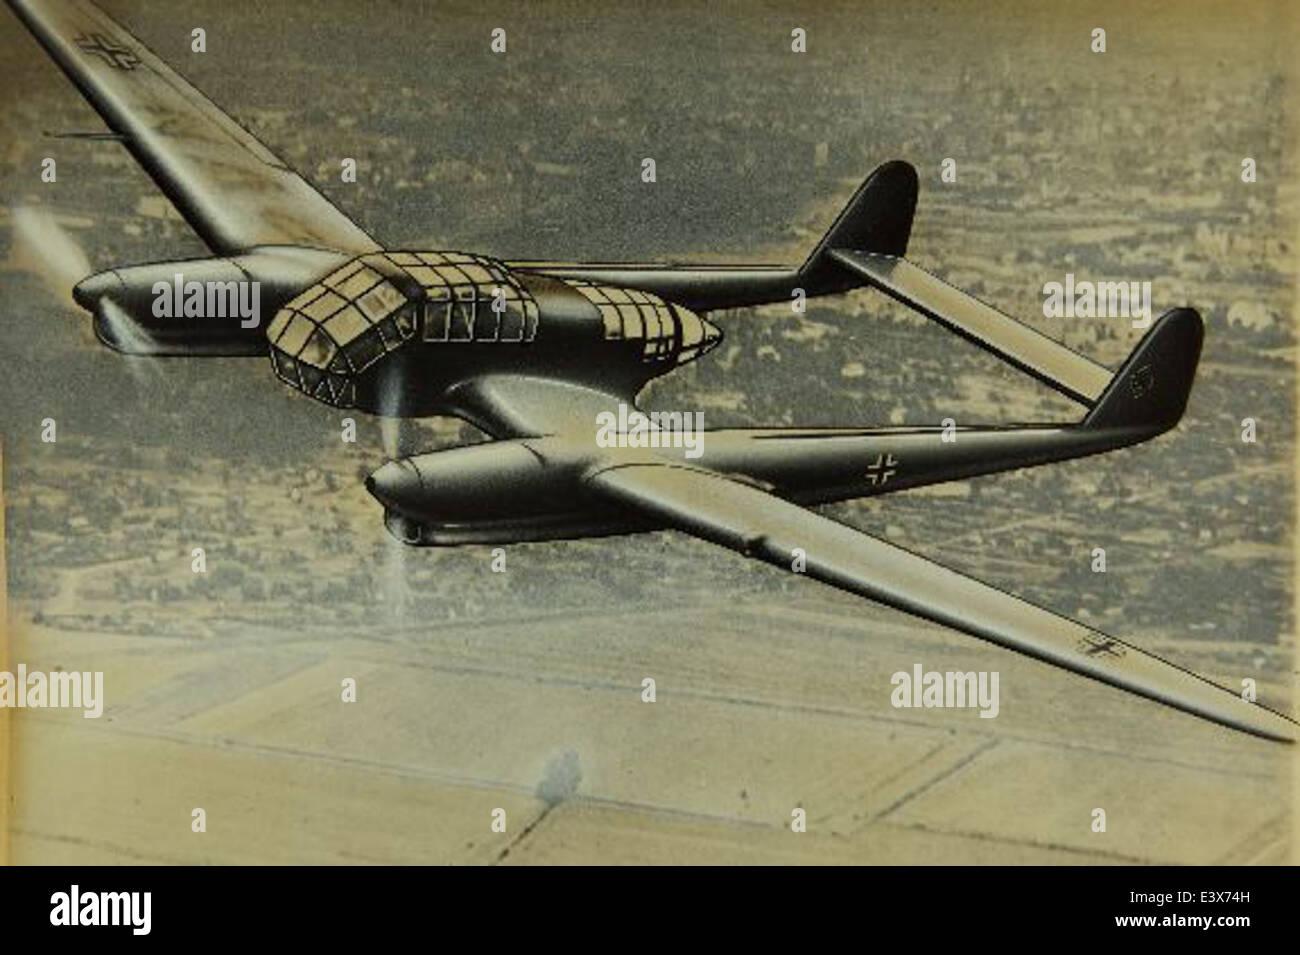 Focke-Wulf Fw 189 - Stock Image